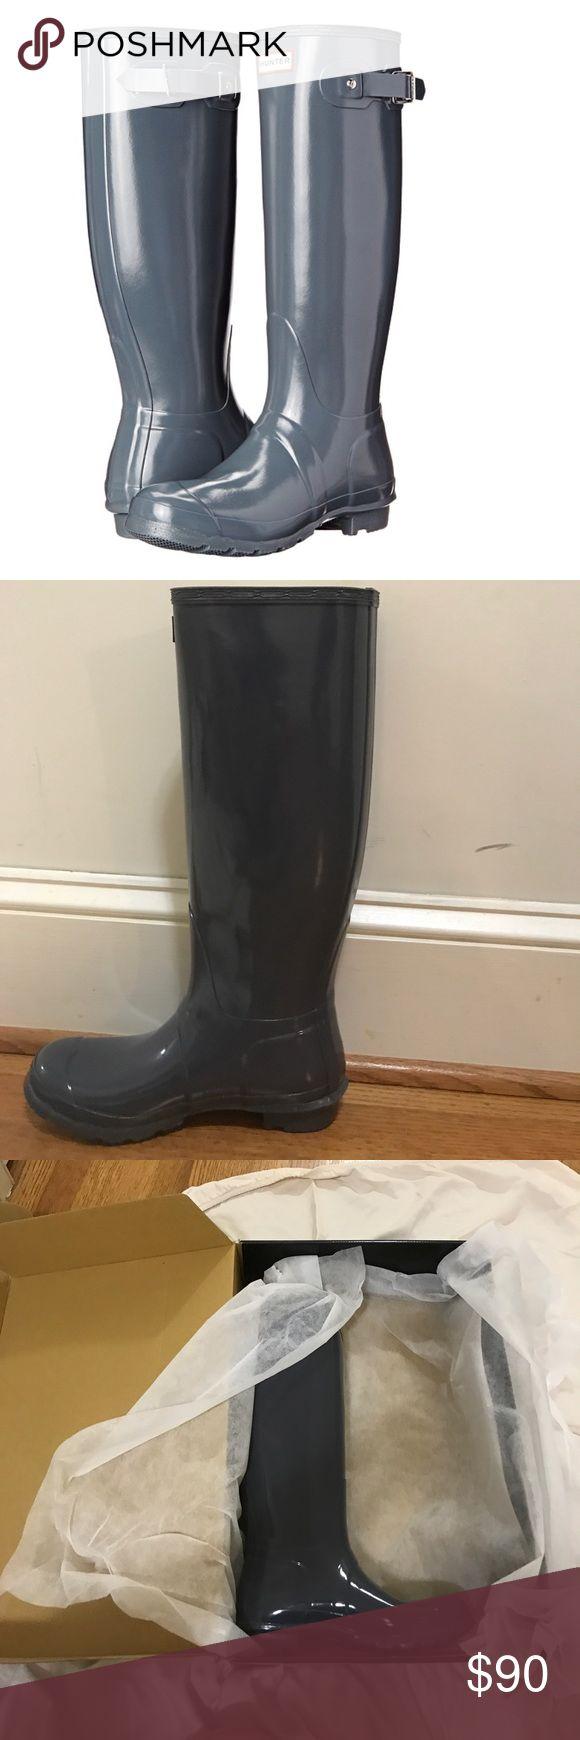 Graphite Gloss Tall Hunter Rain Boots! BRAND NEW!! Brand new authentic hunter rain boots. Great condition never worn Hunter Boots Shoes Winter & Rain Boots